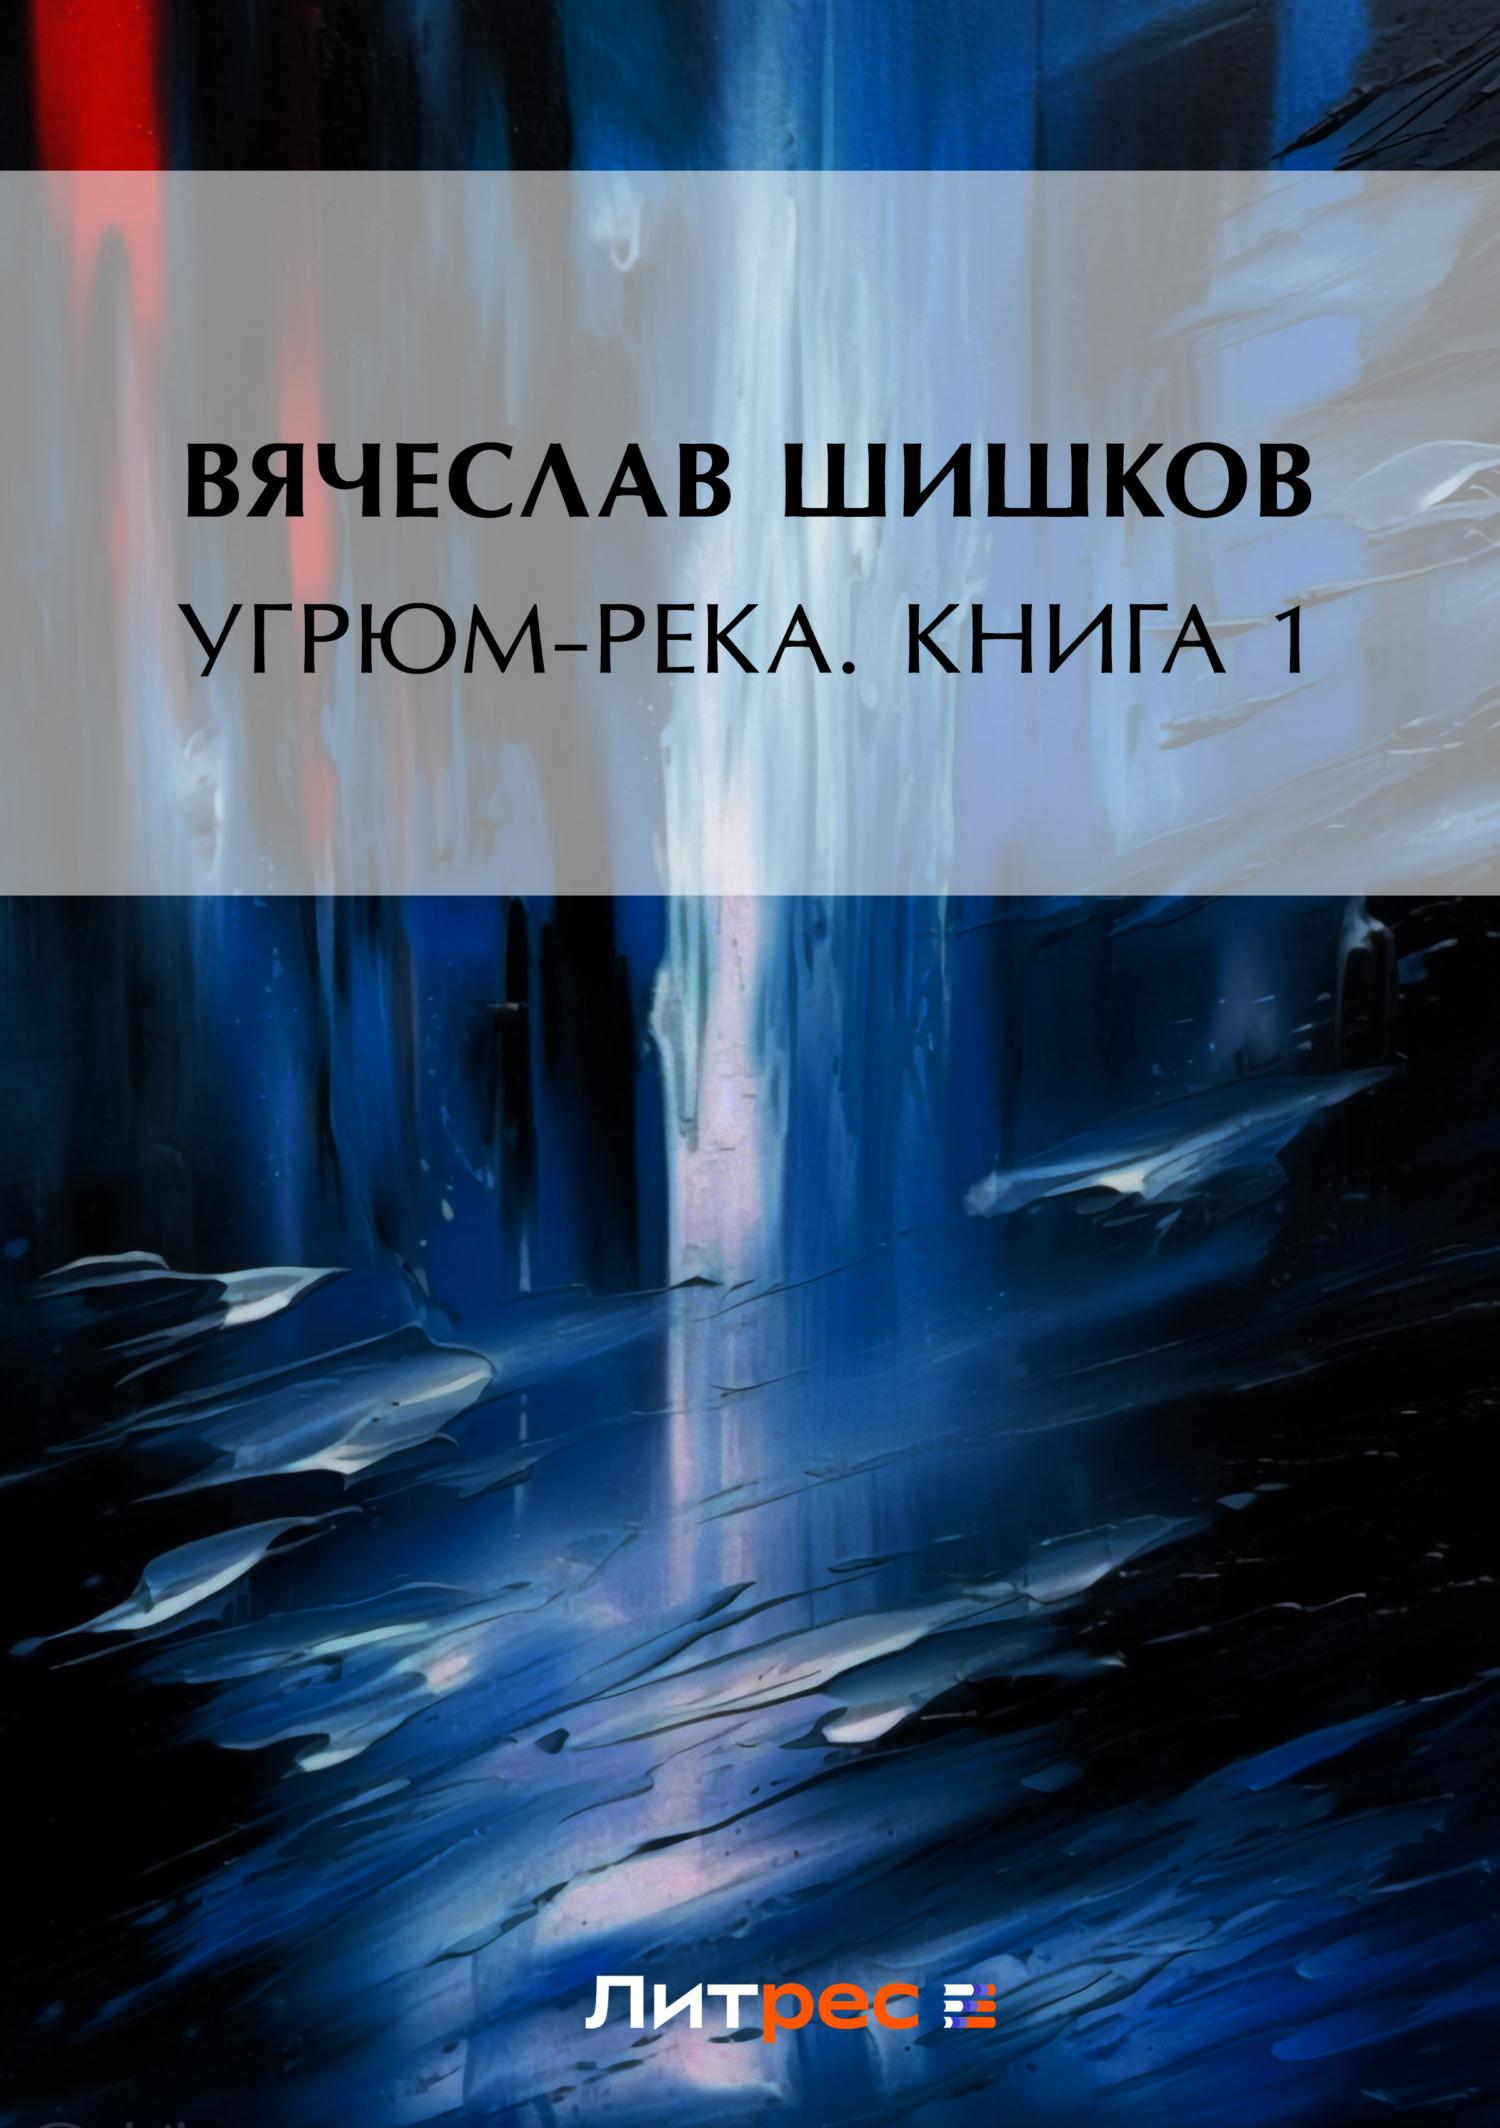 цена Вячеслав Шишков Угрюм-река. Книга 1